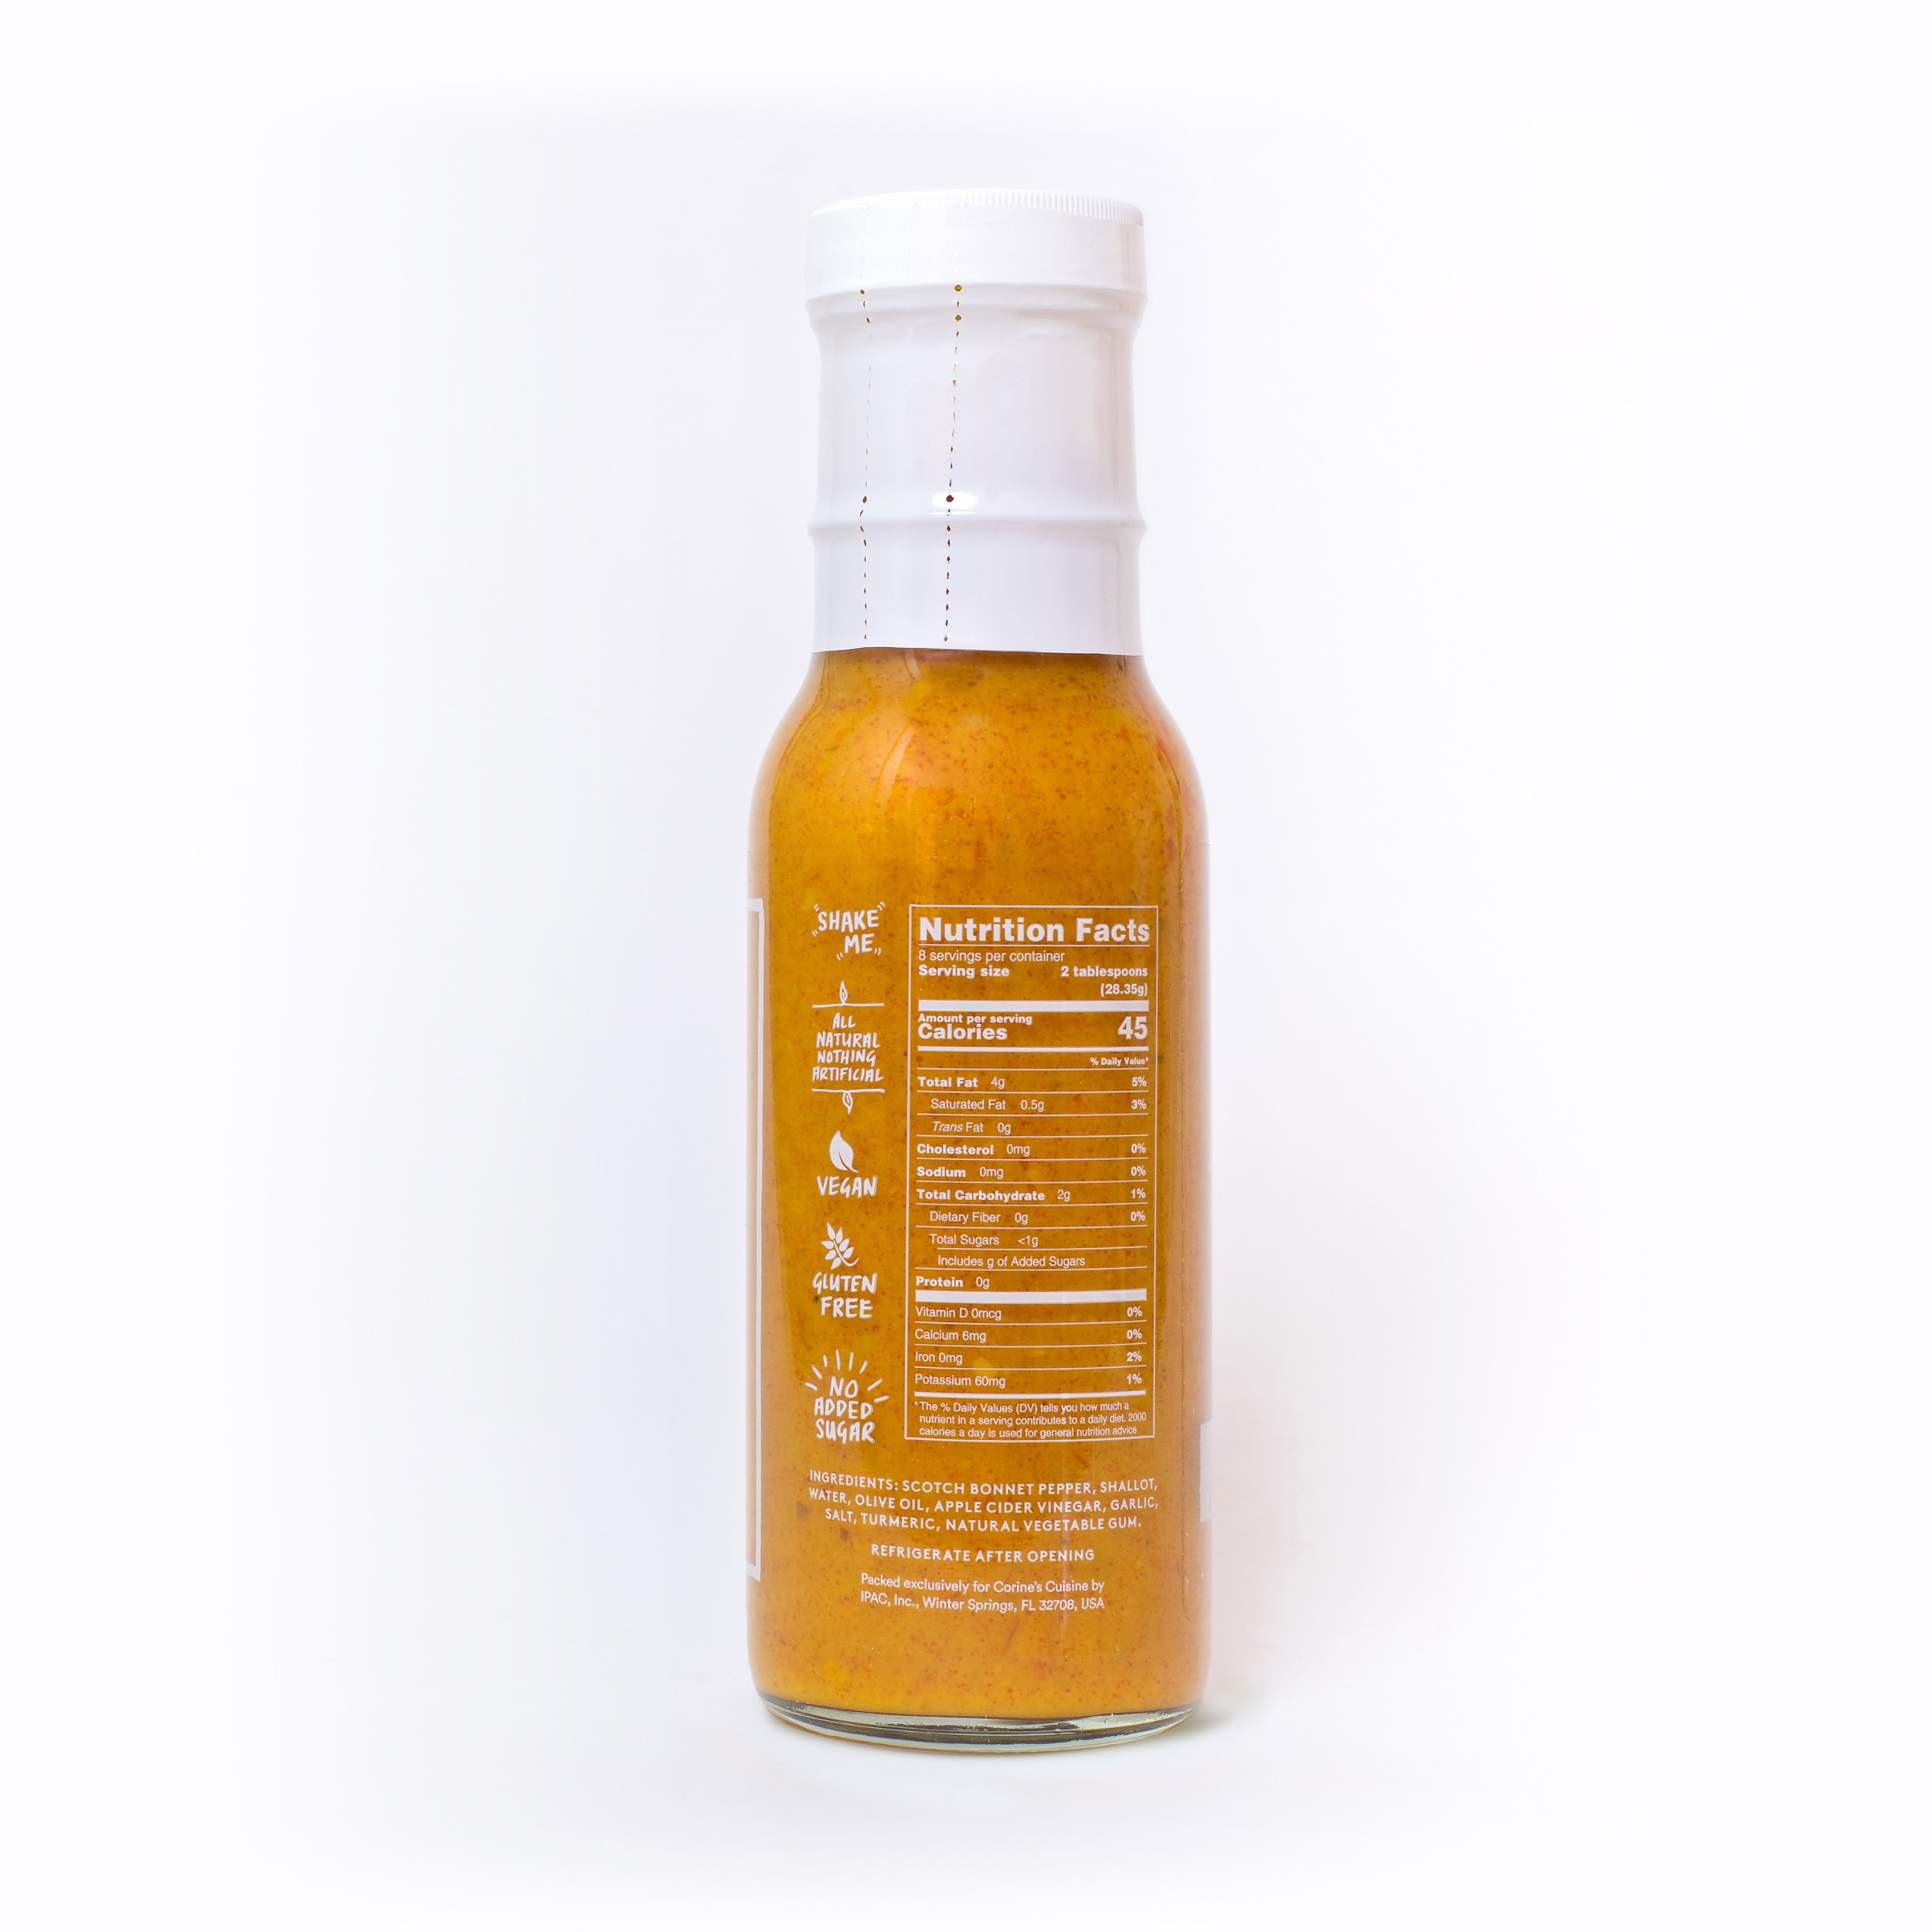 Sauce No  10 — 8 oz — Scotch Bonnet Pepper Sauce — For Dipping, Mixing, &  Seasoning — Corine's Cuisine | Sauces, Spices & Rubs